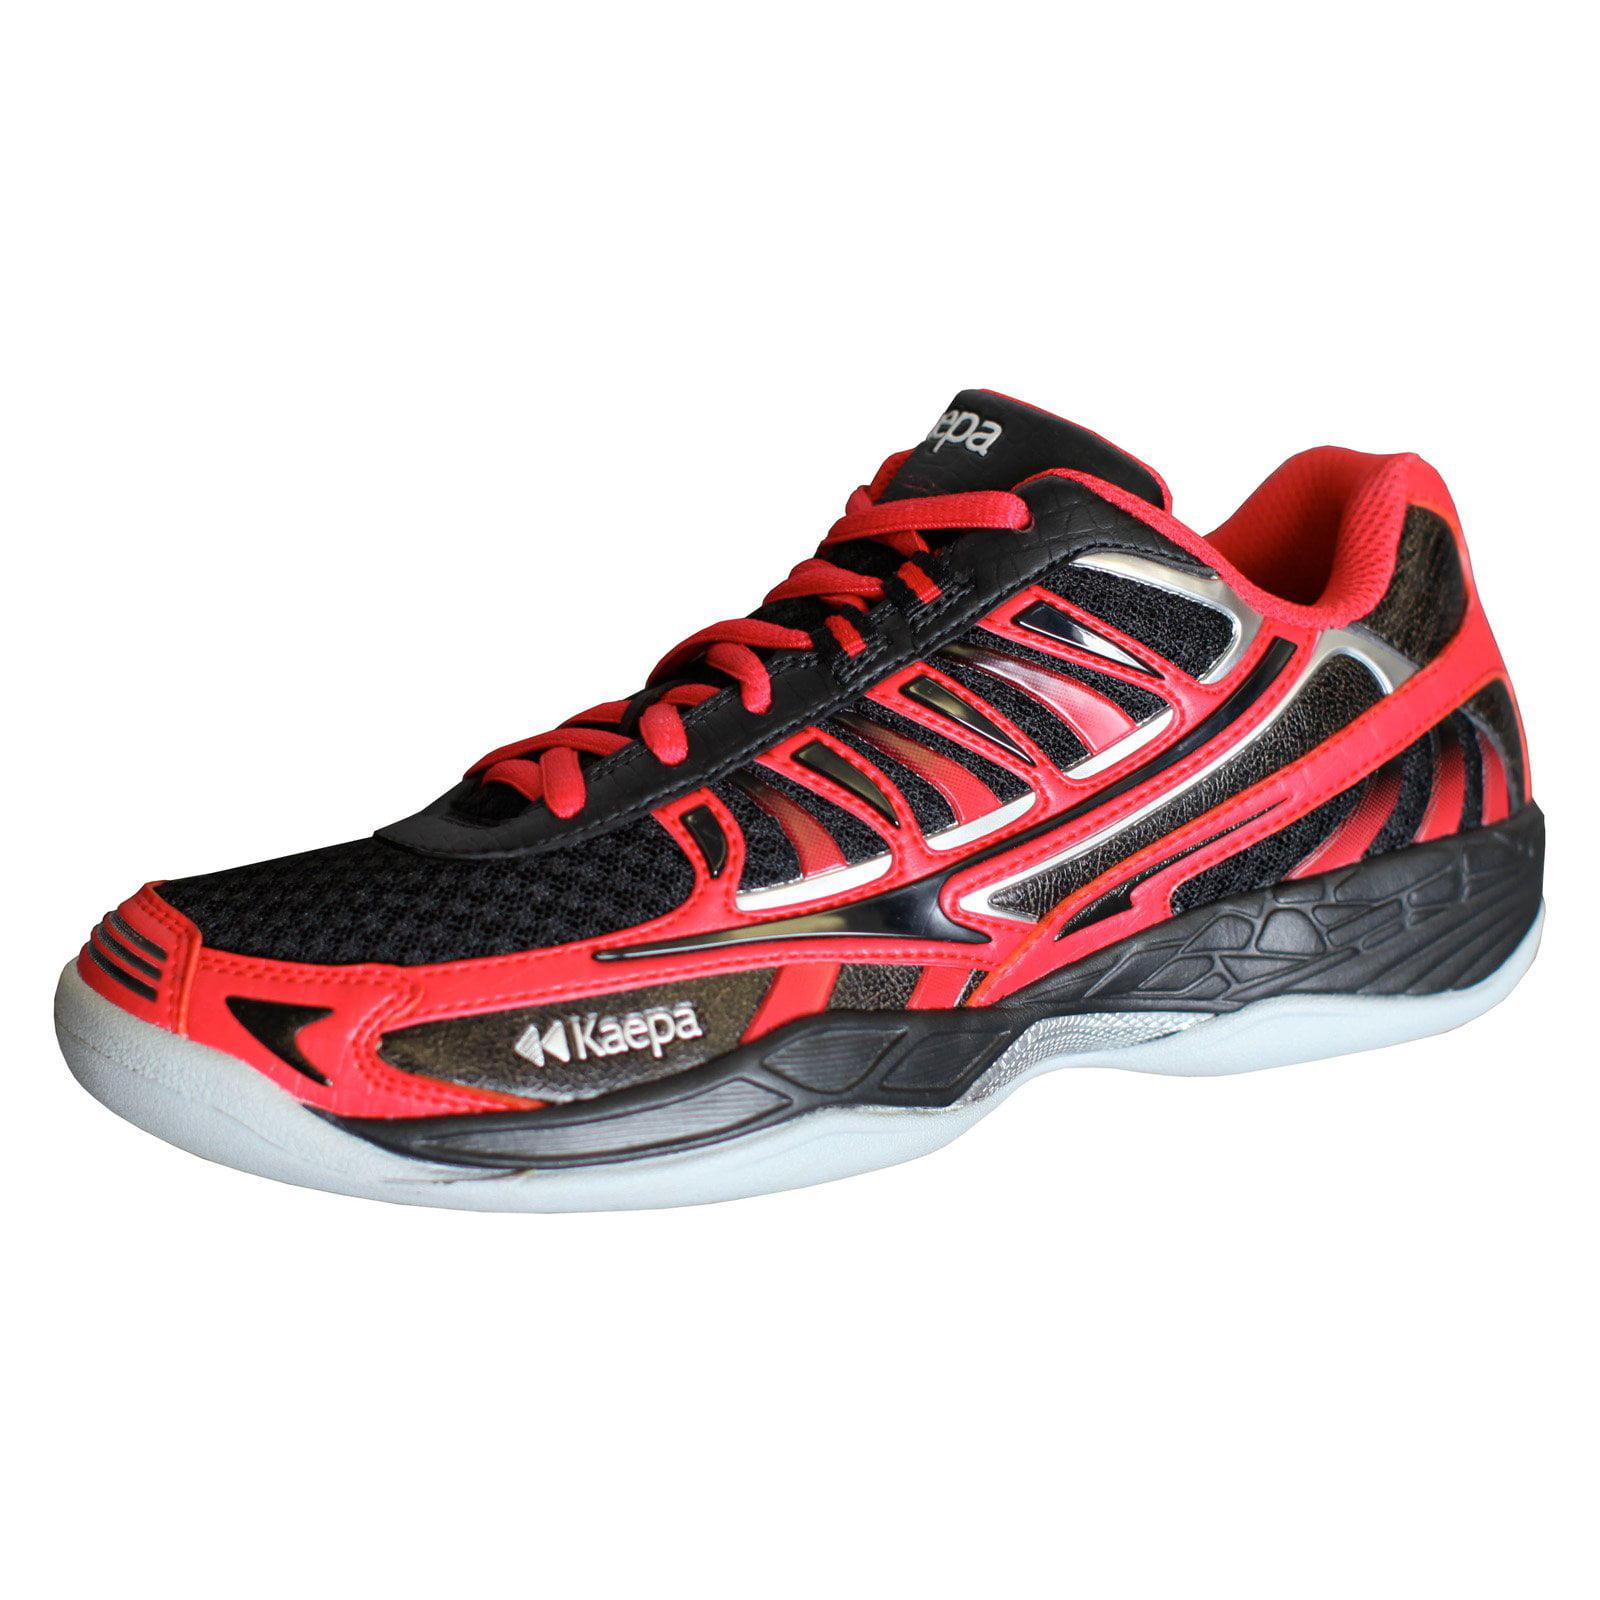 Kaepa Womens Heat Volleyball Shoe - Red - 7 Shoe - Walmart.com